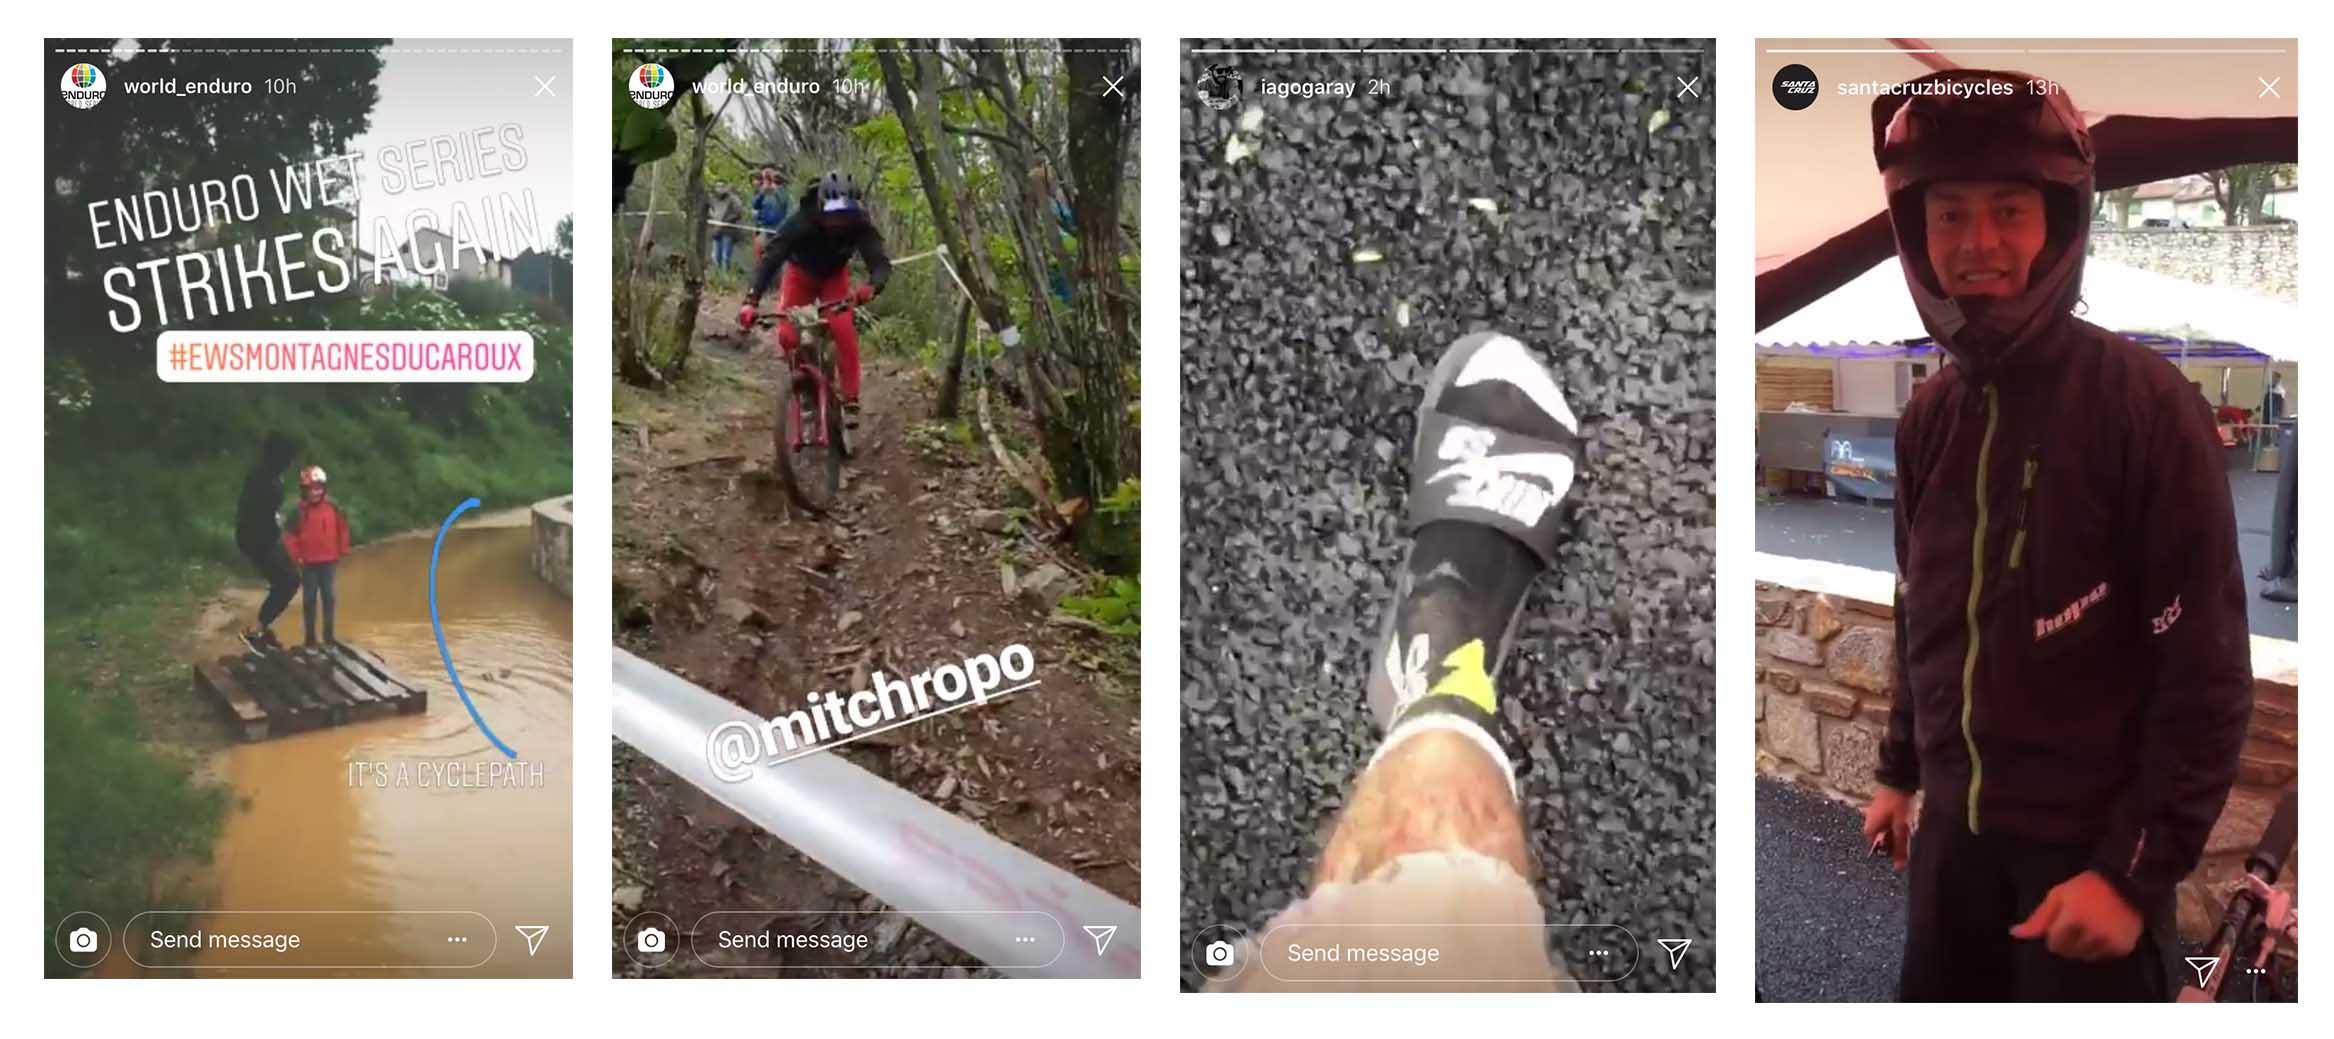 Santa Cruz Bicycles - Instagraom Stories from The Santa Cruz Enduro Team from EWS 3 in France